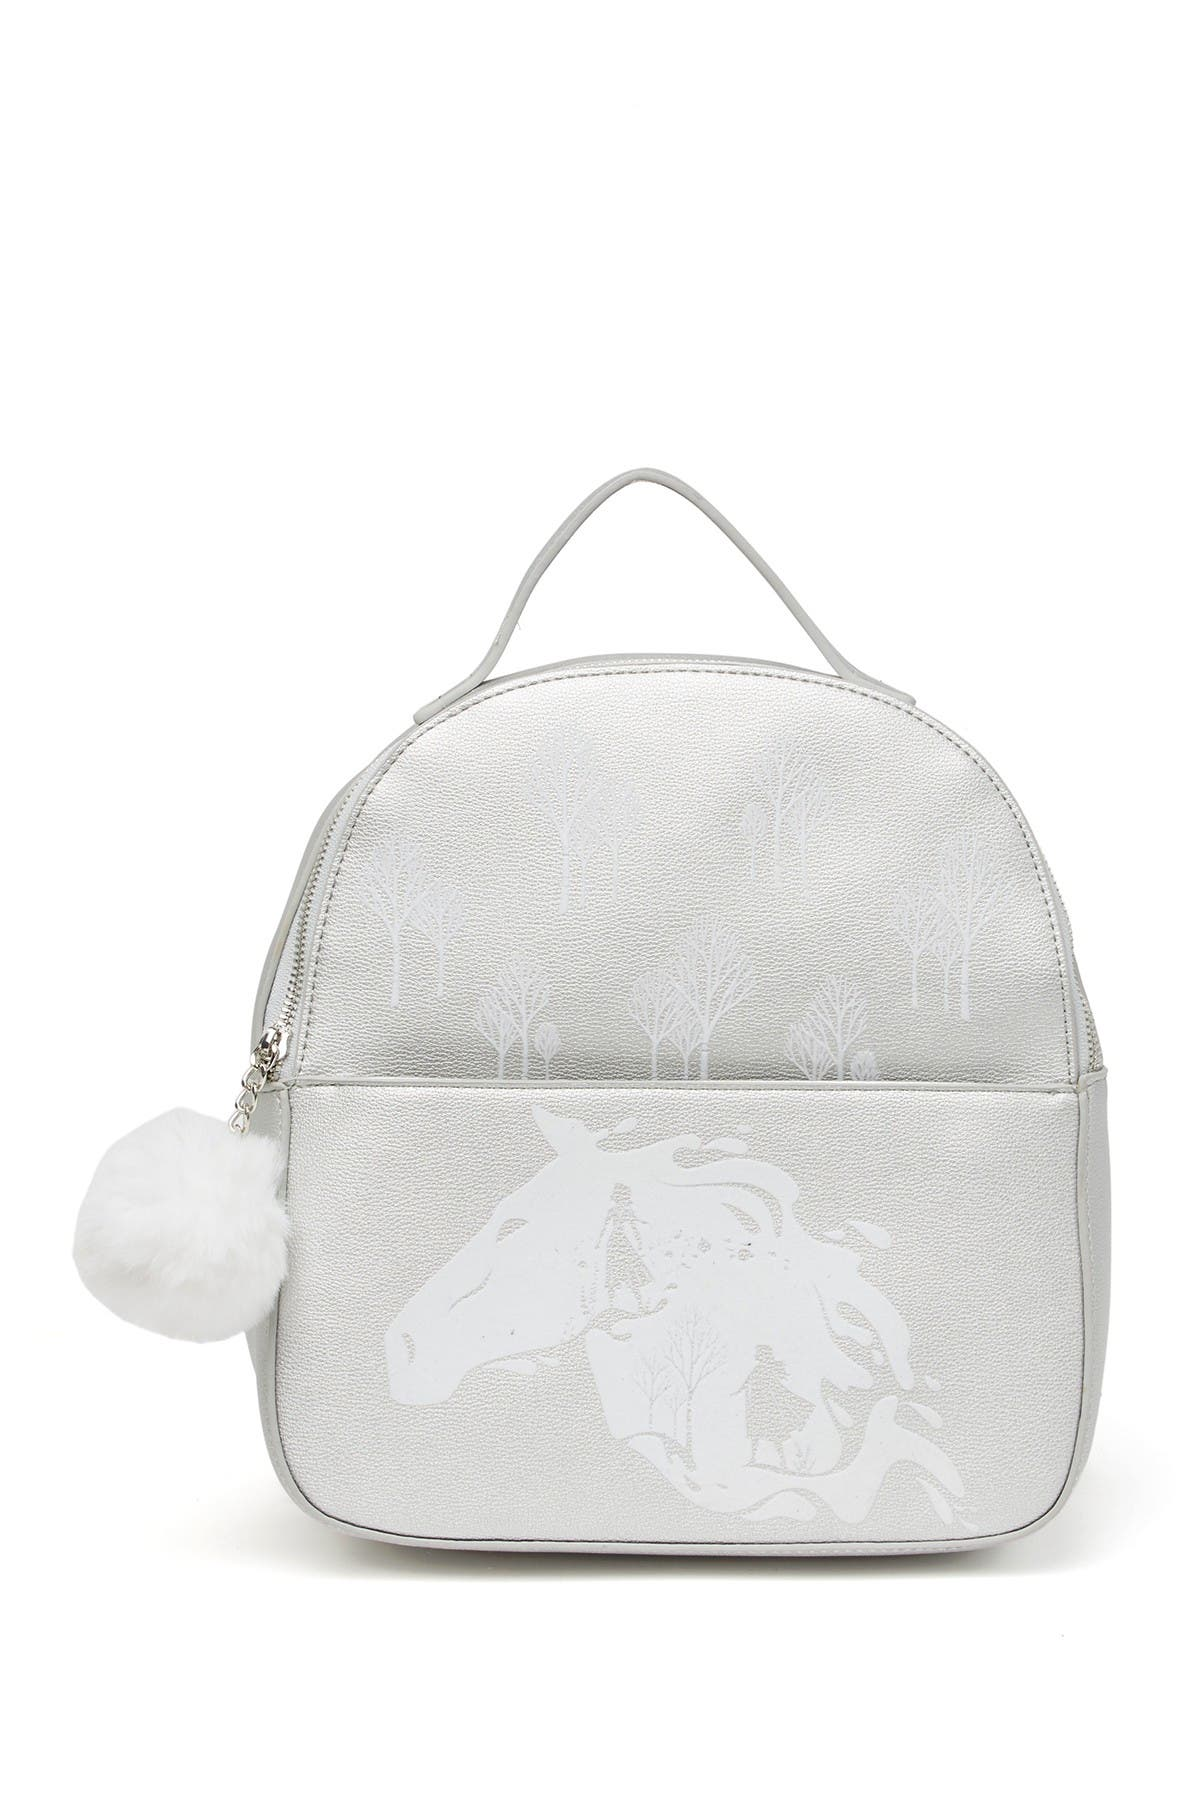 Image of Danielle Nicole Frozen 2 Pompom Backpack